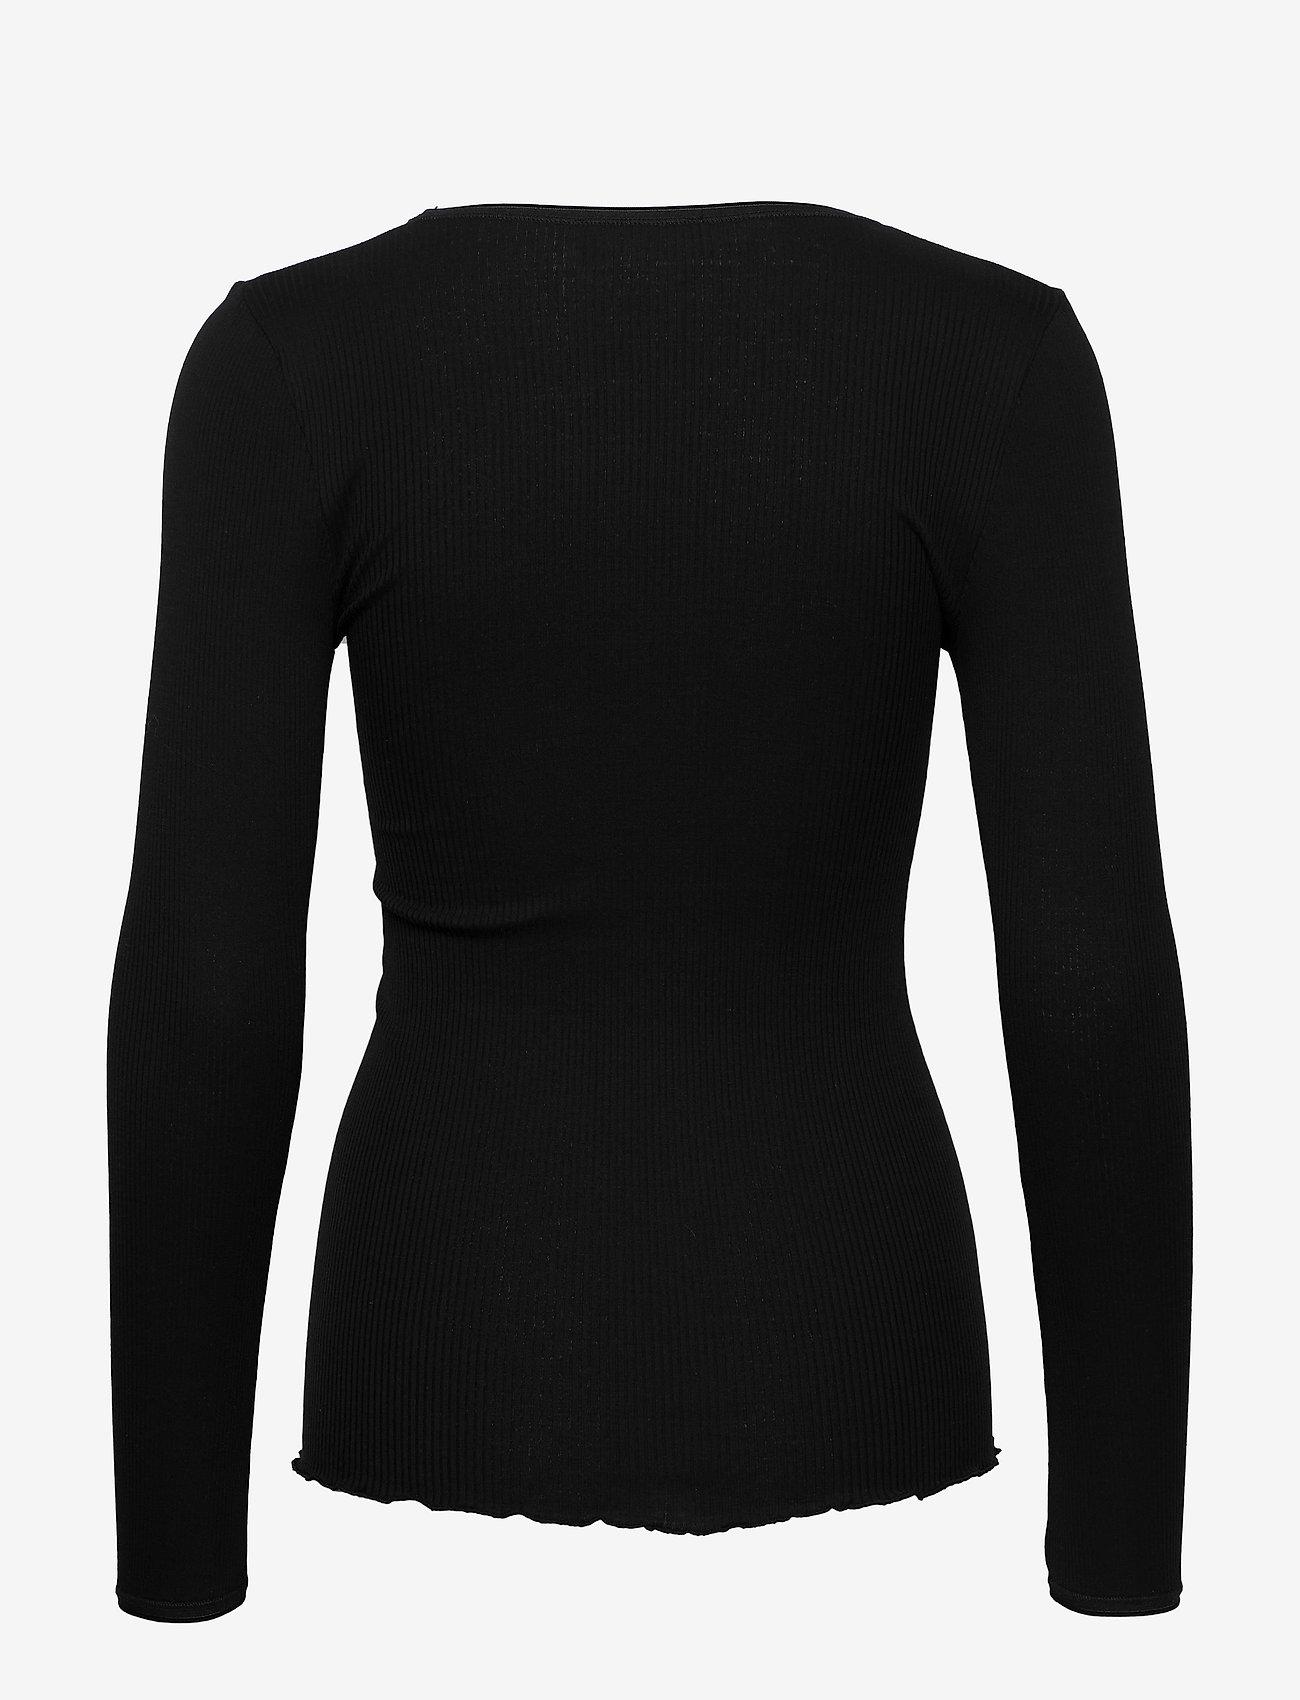 Rosemunde - Silk t-shirt w/ elastic band - långärmade toppar - black - 1